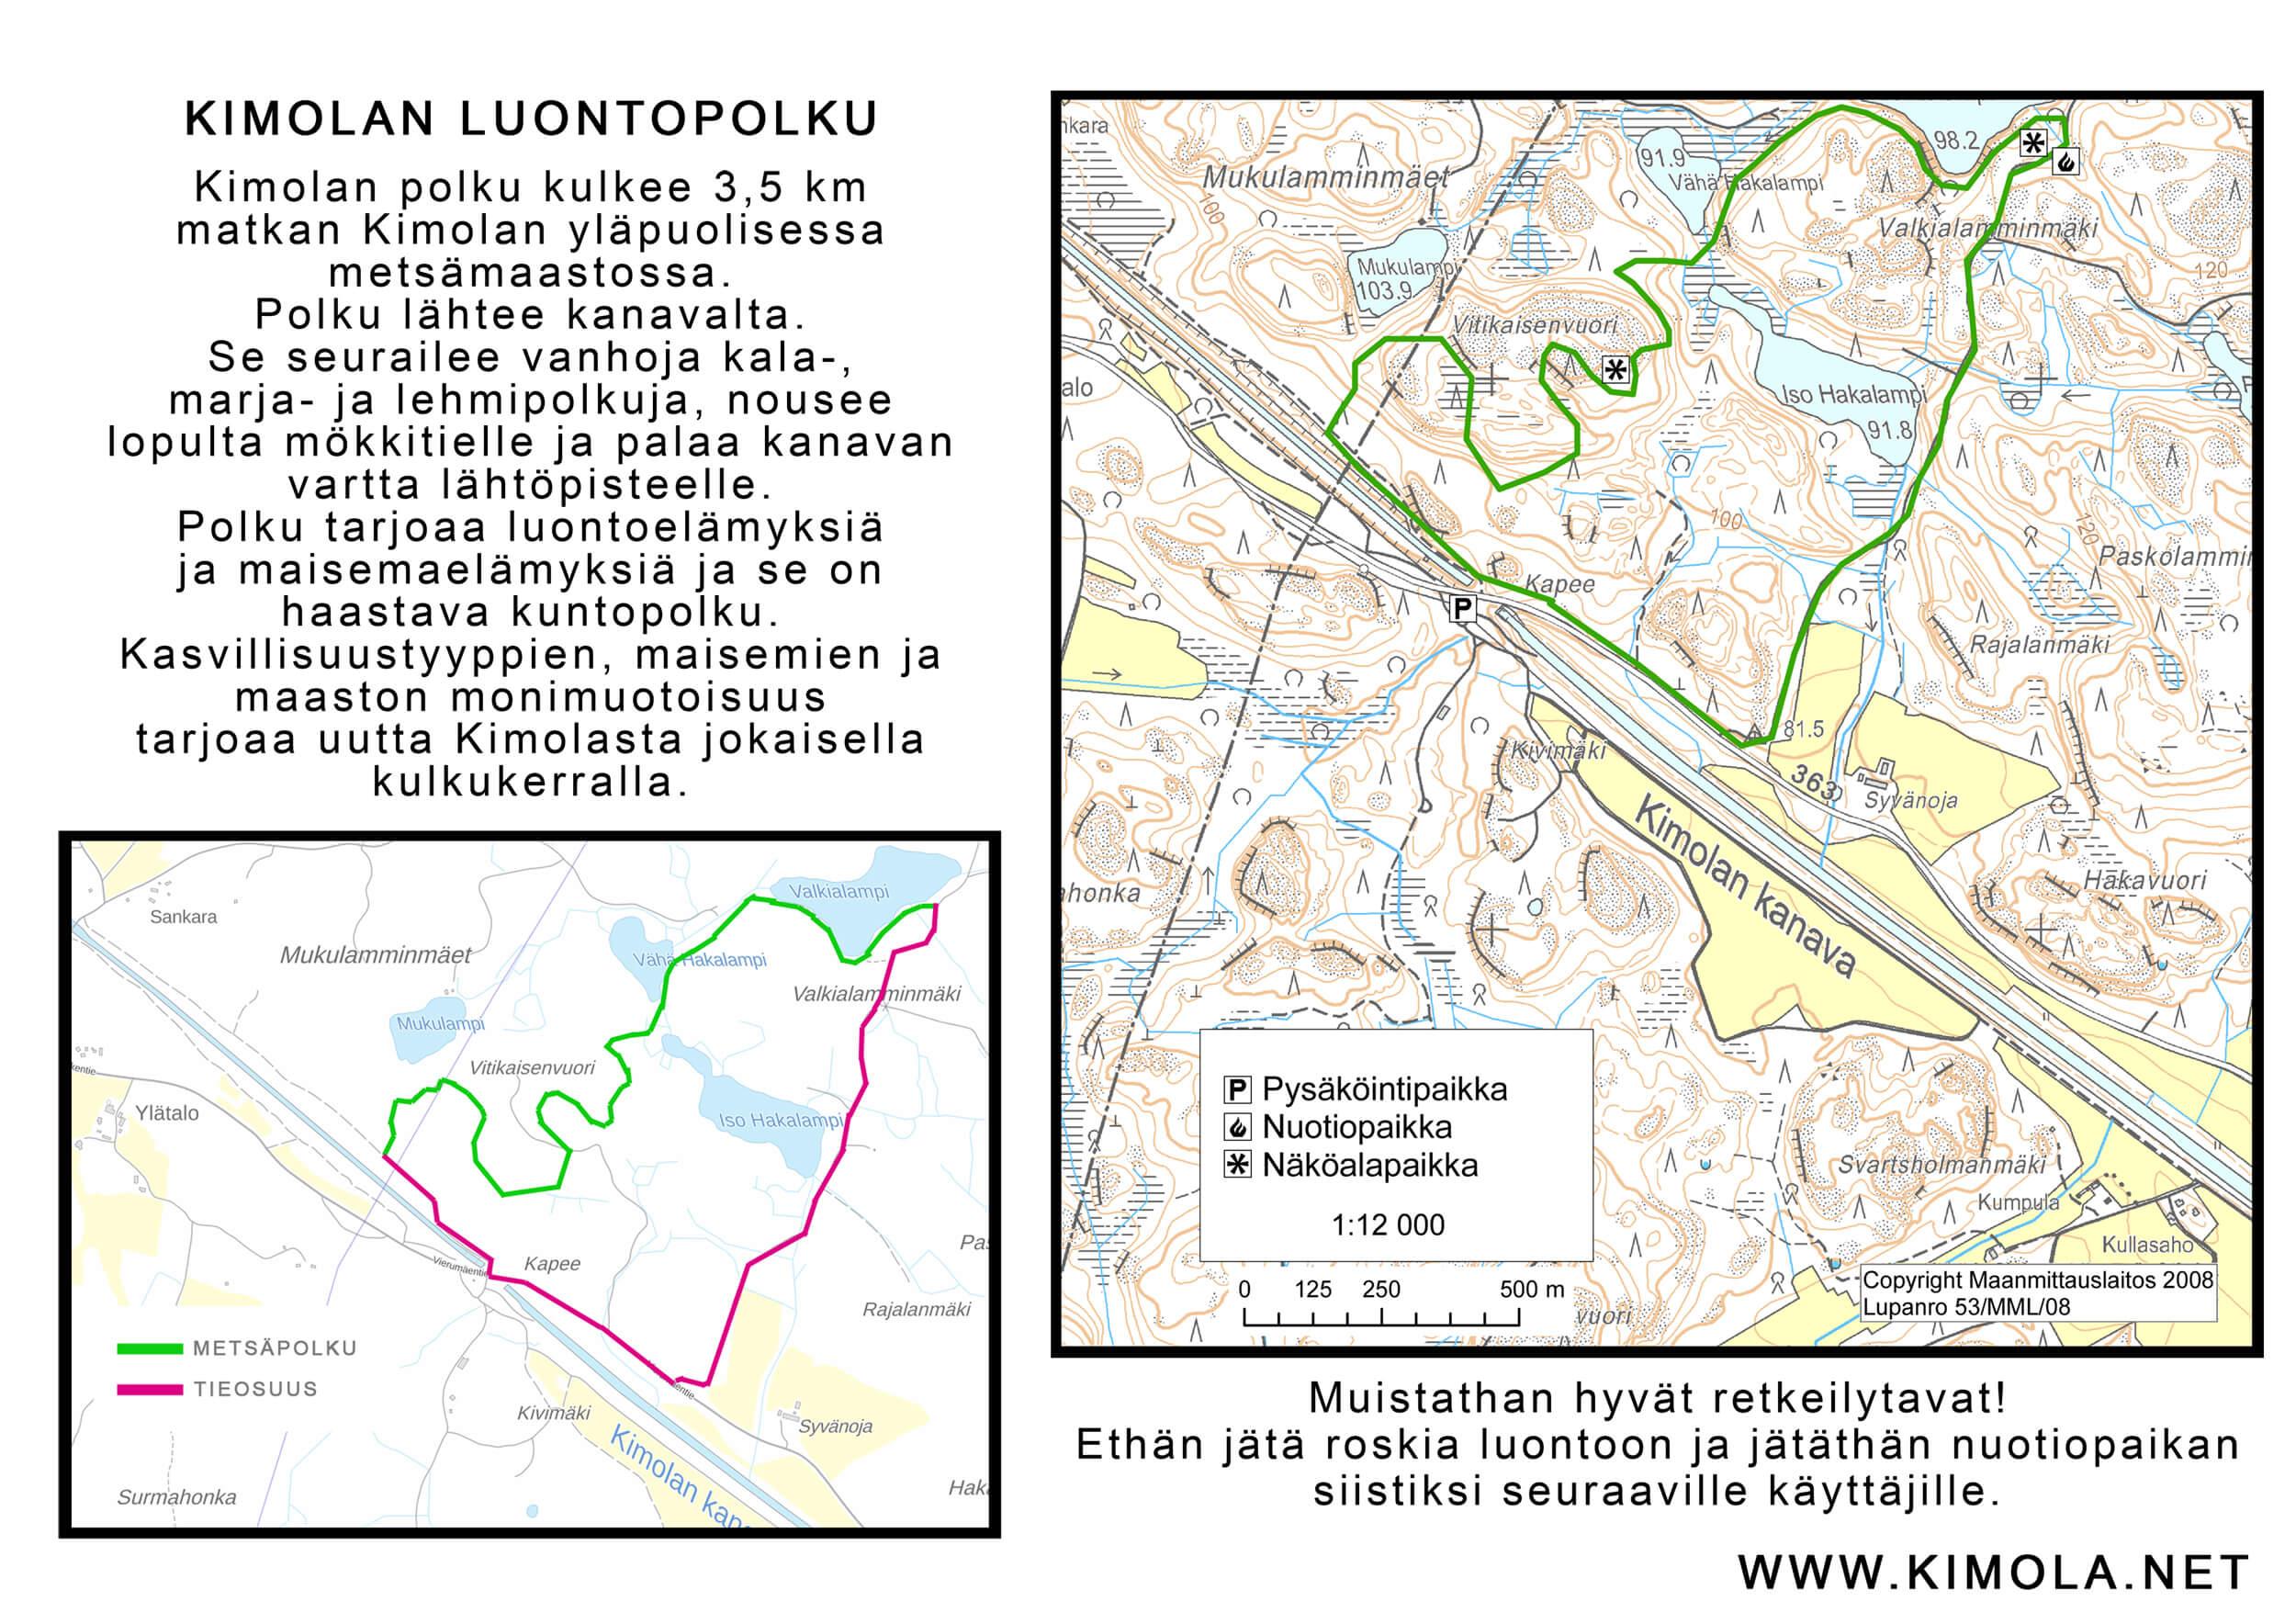 Kimolan luontopolku kartta